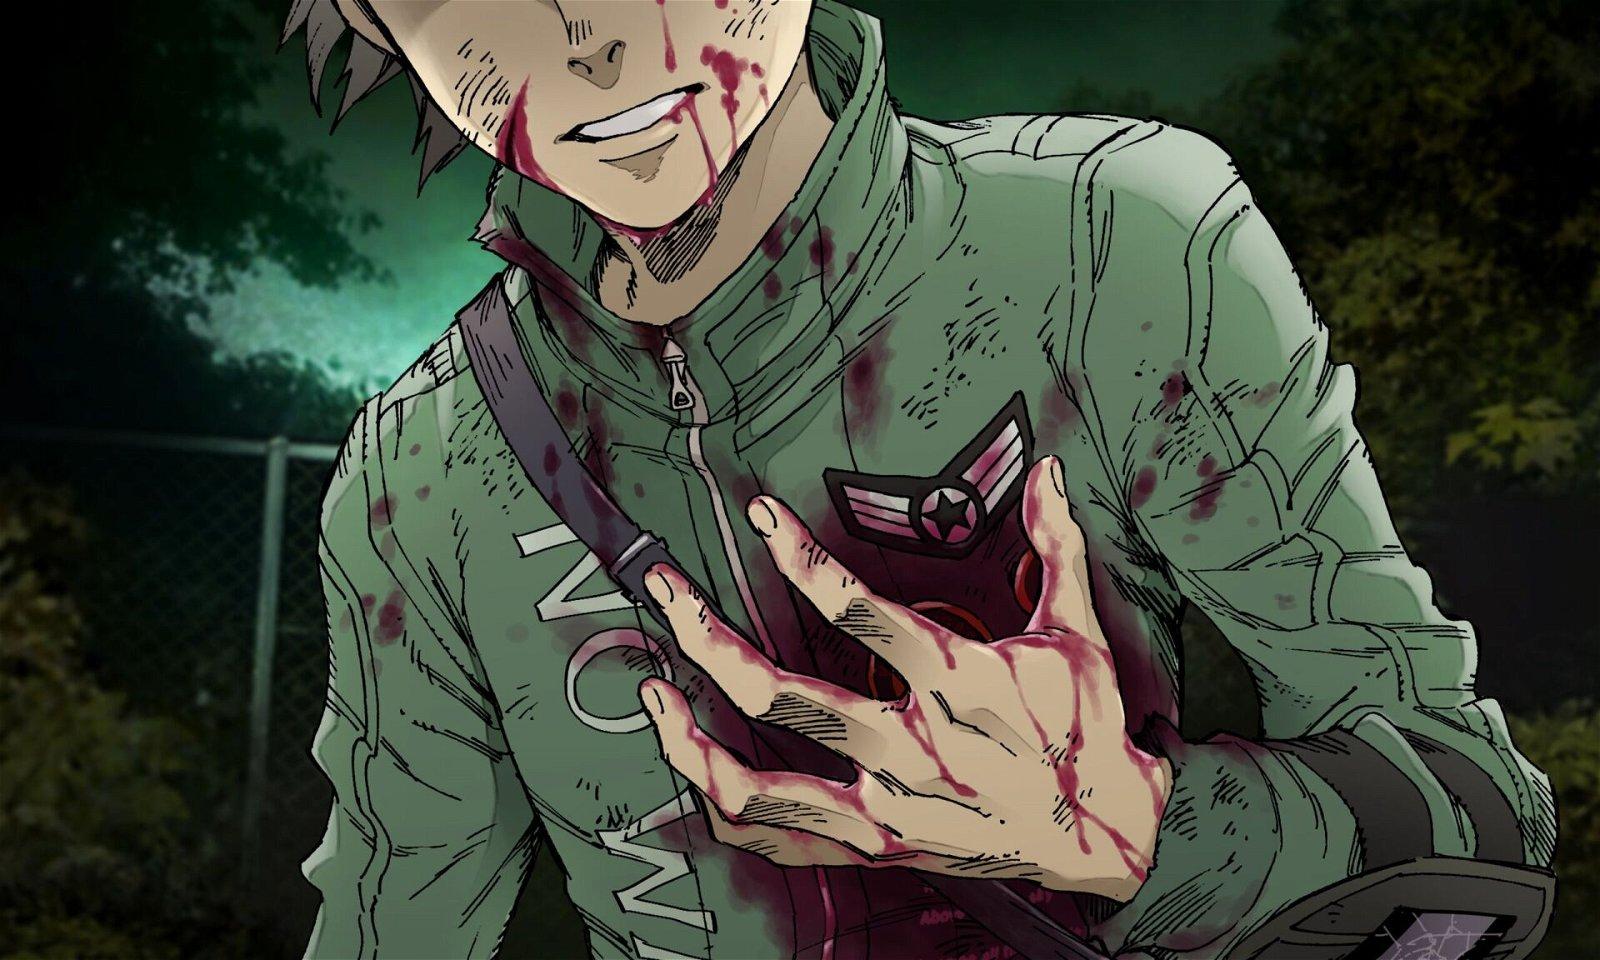 Shin Megami Tensai IV: Apocalypse coming to North America Summer 2016